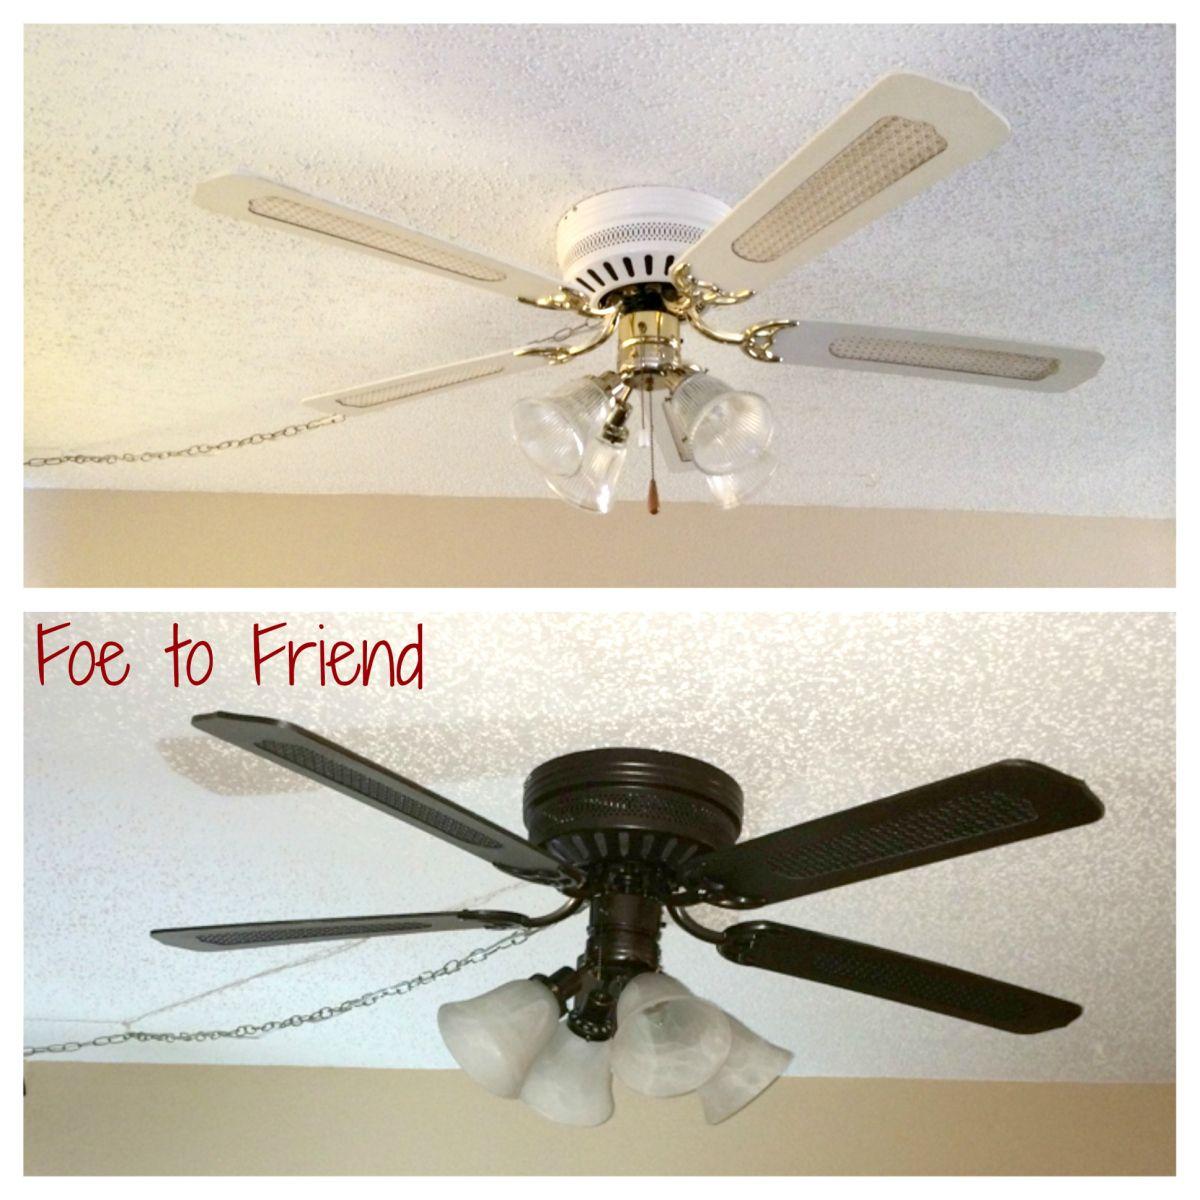 Diy Old Ceiling Fan Refresh Ceiling Fan Diy Ceiling Fan Redo Ceiling Fan Makeover